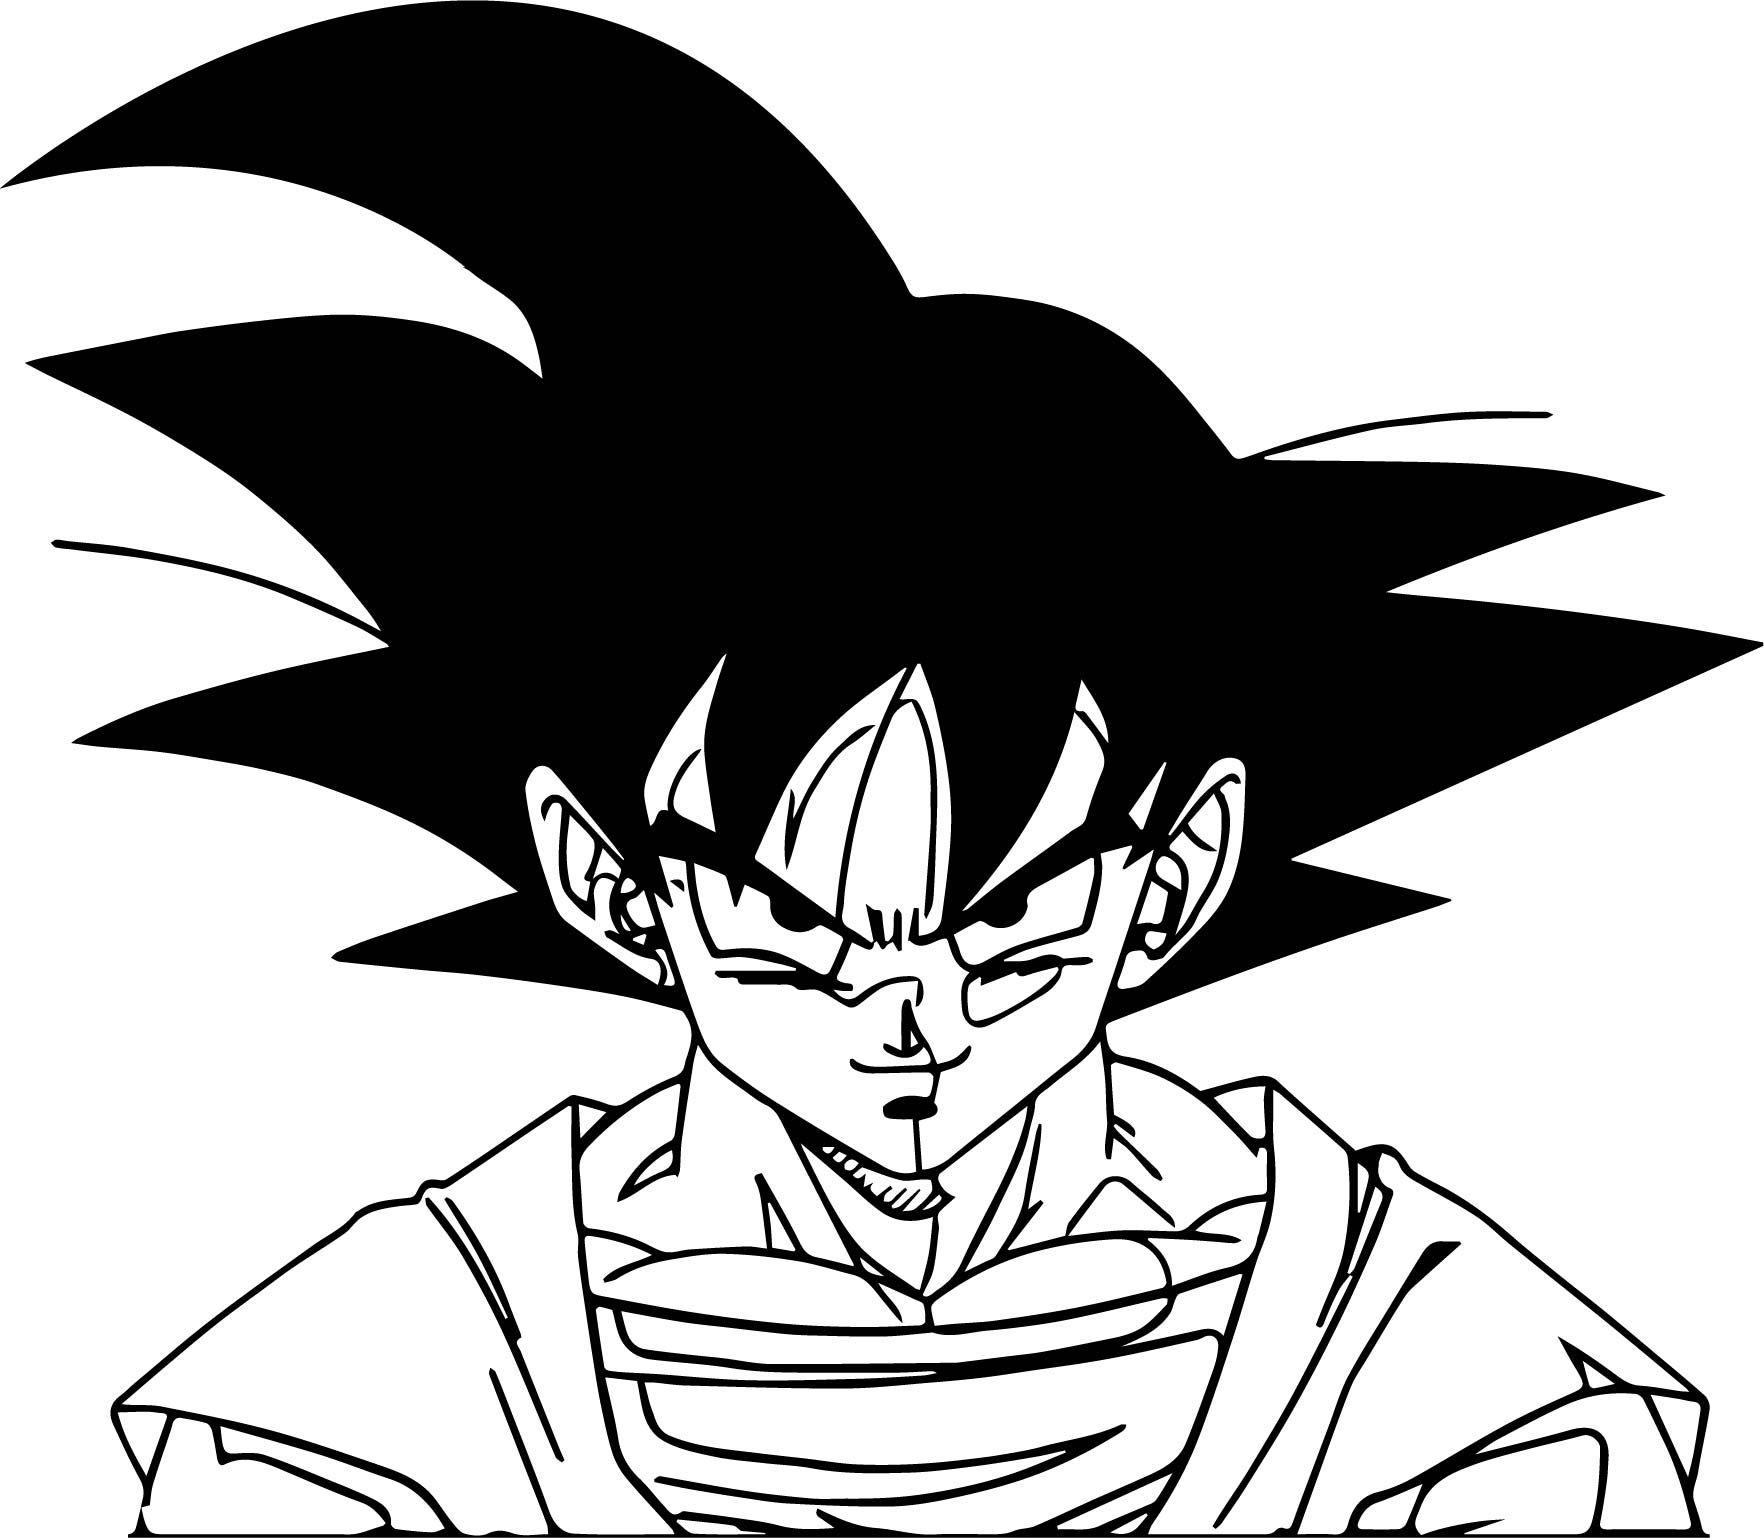 Cool Goku Smile Face Coloring Page Animal Coloring Pages Coloring Pictures Coloring Pages